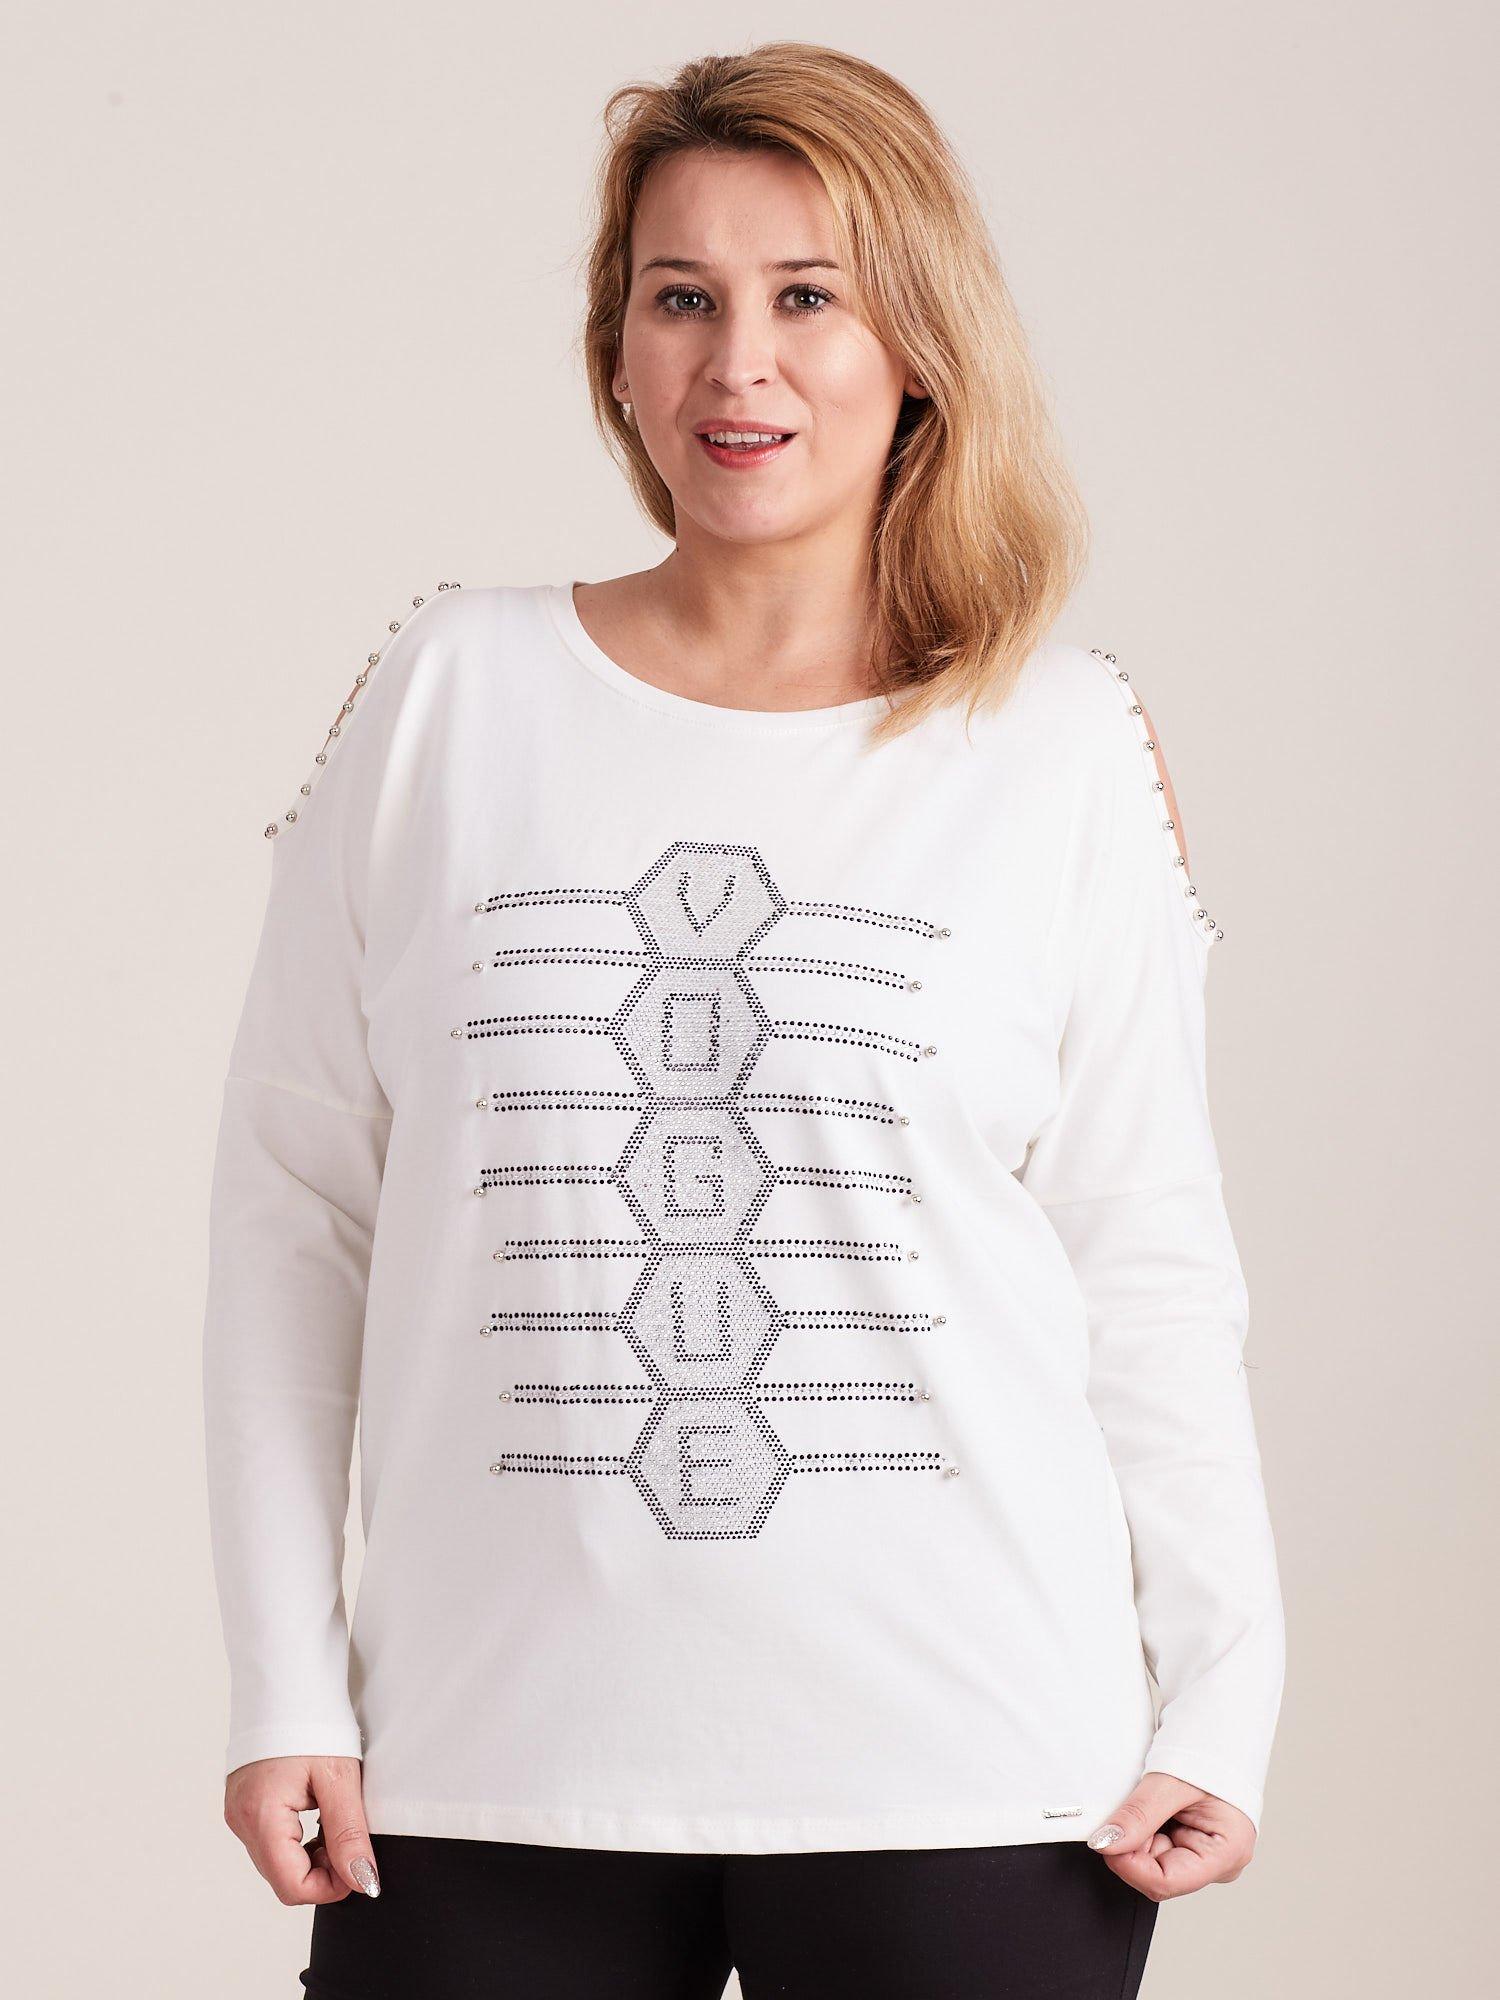 c1f4004a4a0493 Ecru bluzka cold shoulder z aplikacją PLUS SIZE - Bluzka plus size ...